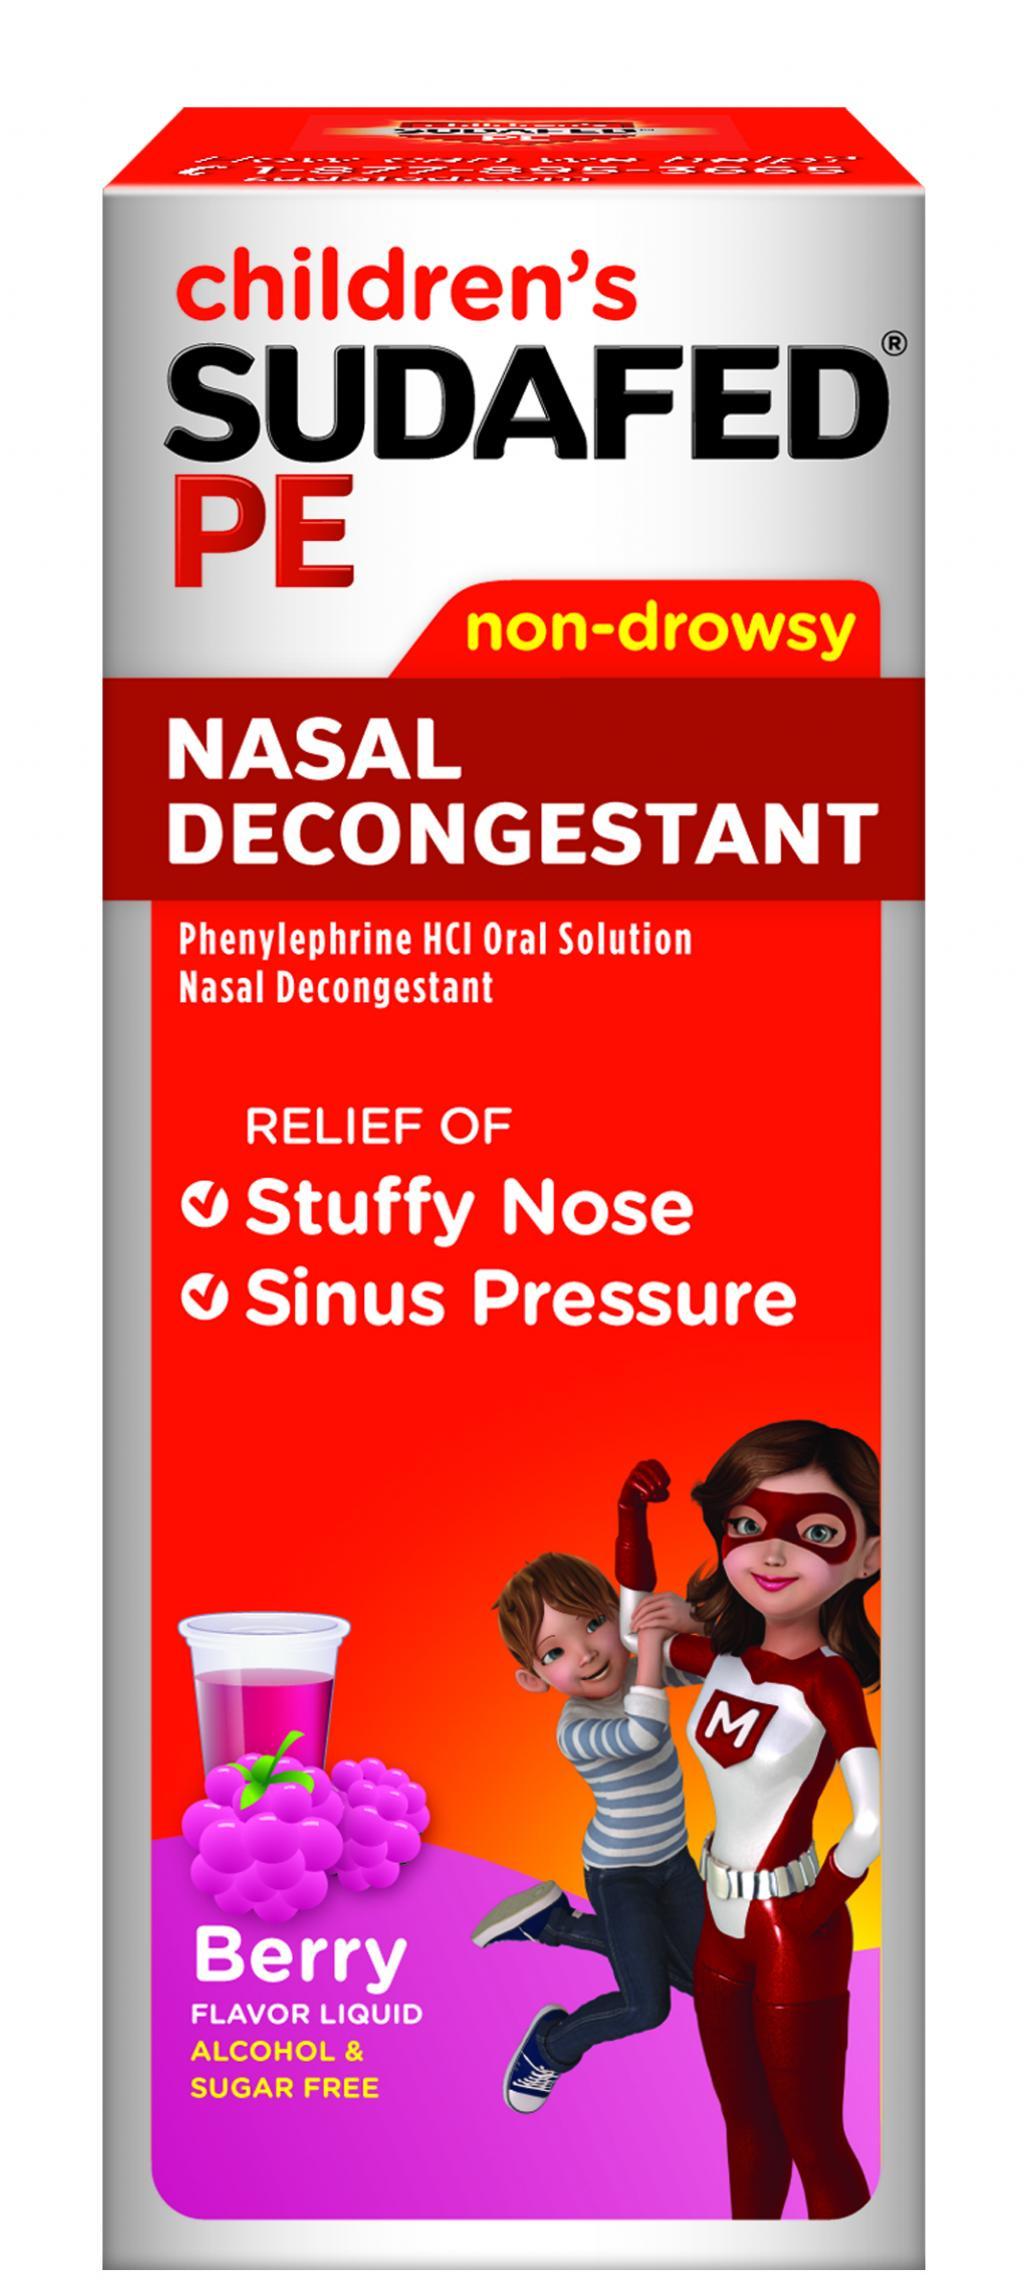 CHILDREN'S SUDAFED PE® NASAL DECONGESTANT | SUDAFED®